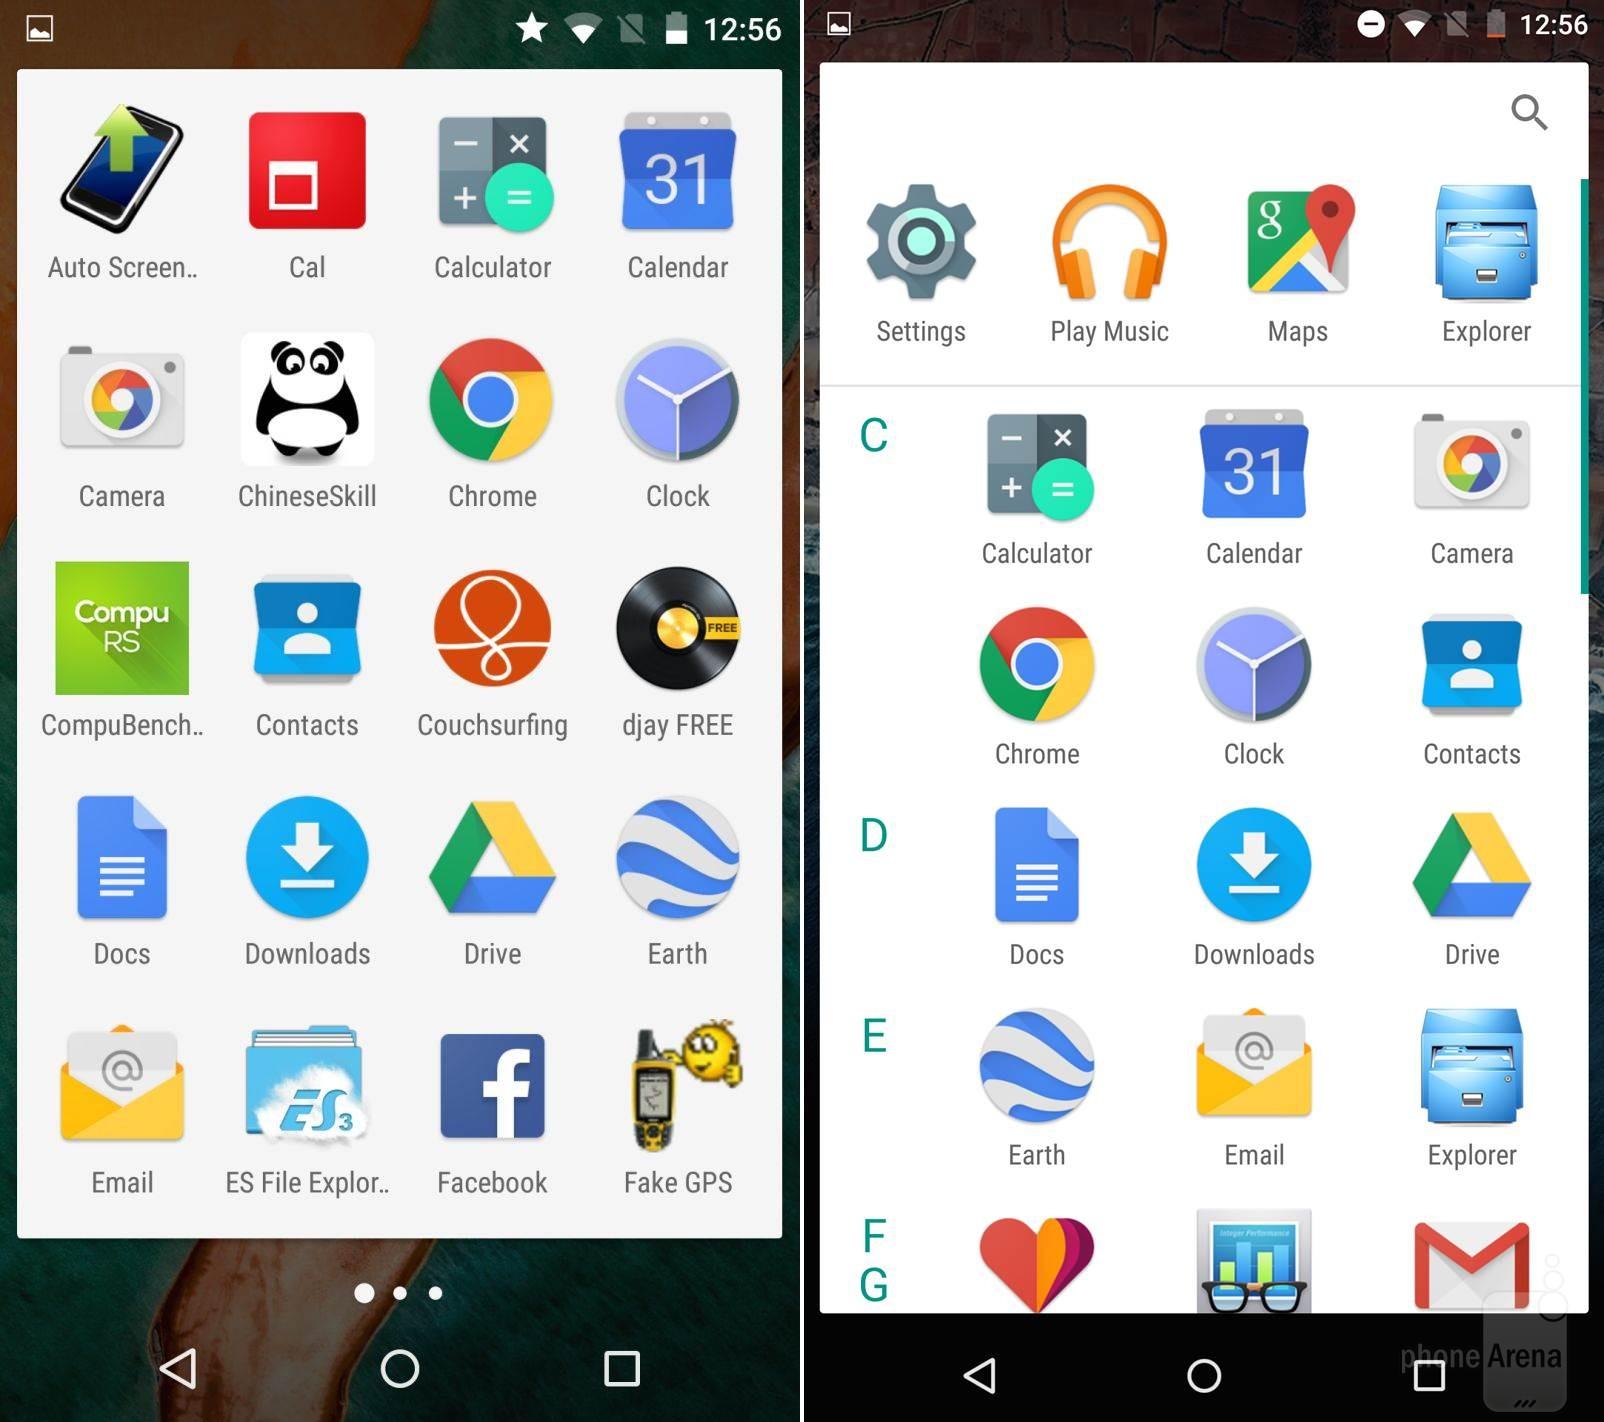 Android Marshmallow vs Android Lollipop: principali differenze 1